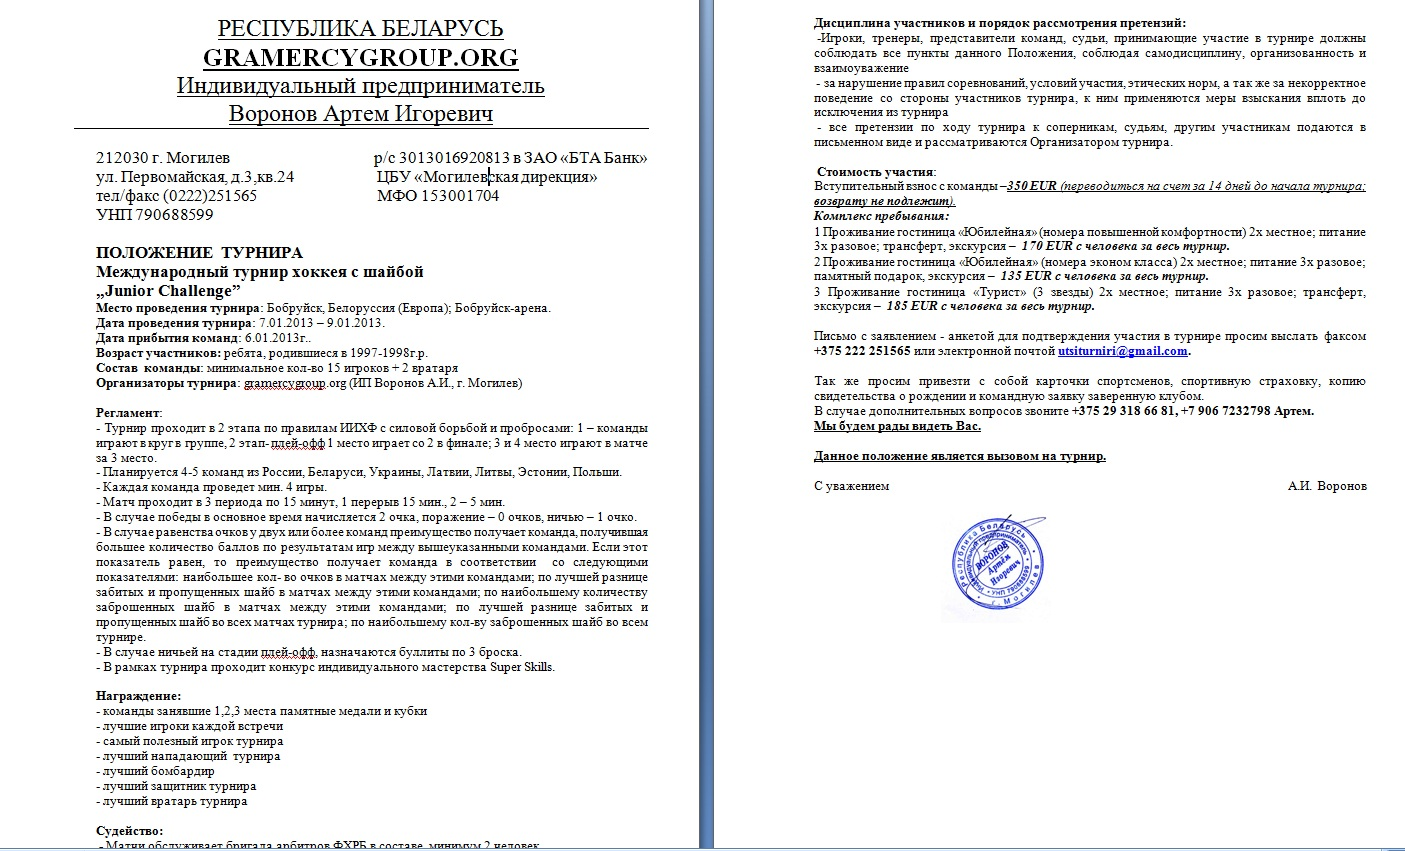 Курс евро на 27.12 2012